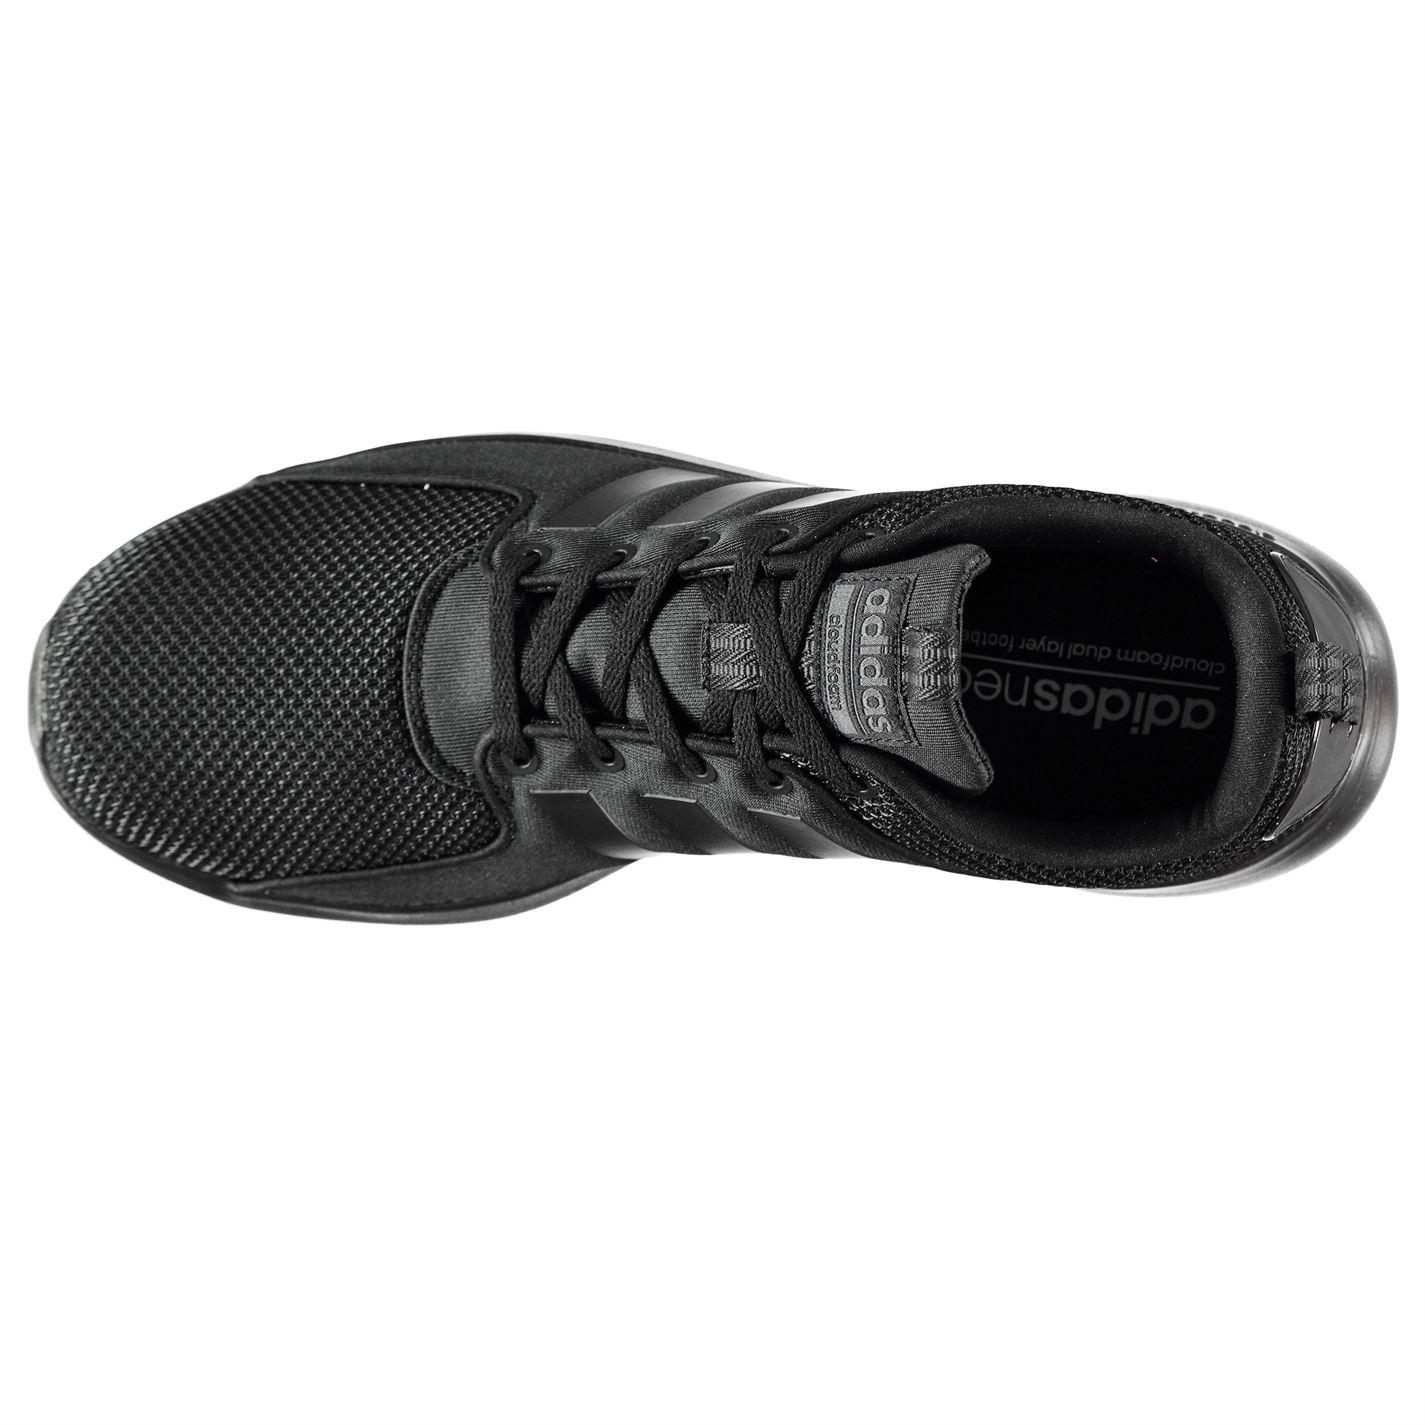 Adidas Cloud Foam Lite Racer scarpe da ginnastica Mens Gents Gents Gents Runners Laces Fastened Padded   Fine Anno Vendita Speciale    Scolaro/Ragazze Scarpa  0835fc